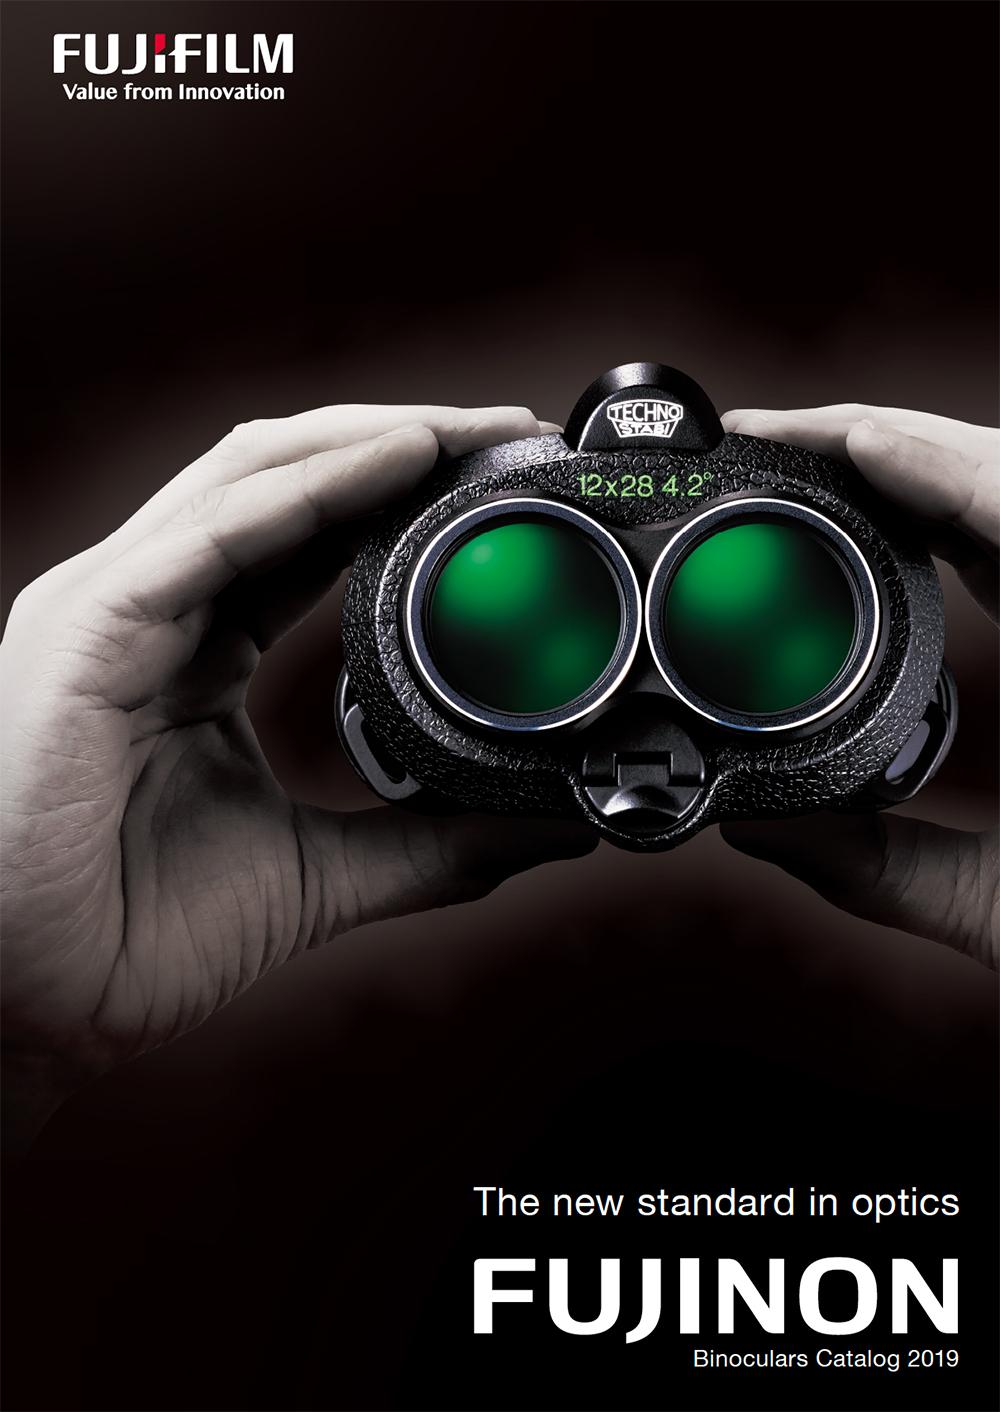 [photo] Hands holding Fujinon binoculars that have dark green lenses